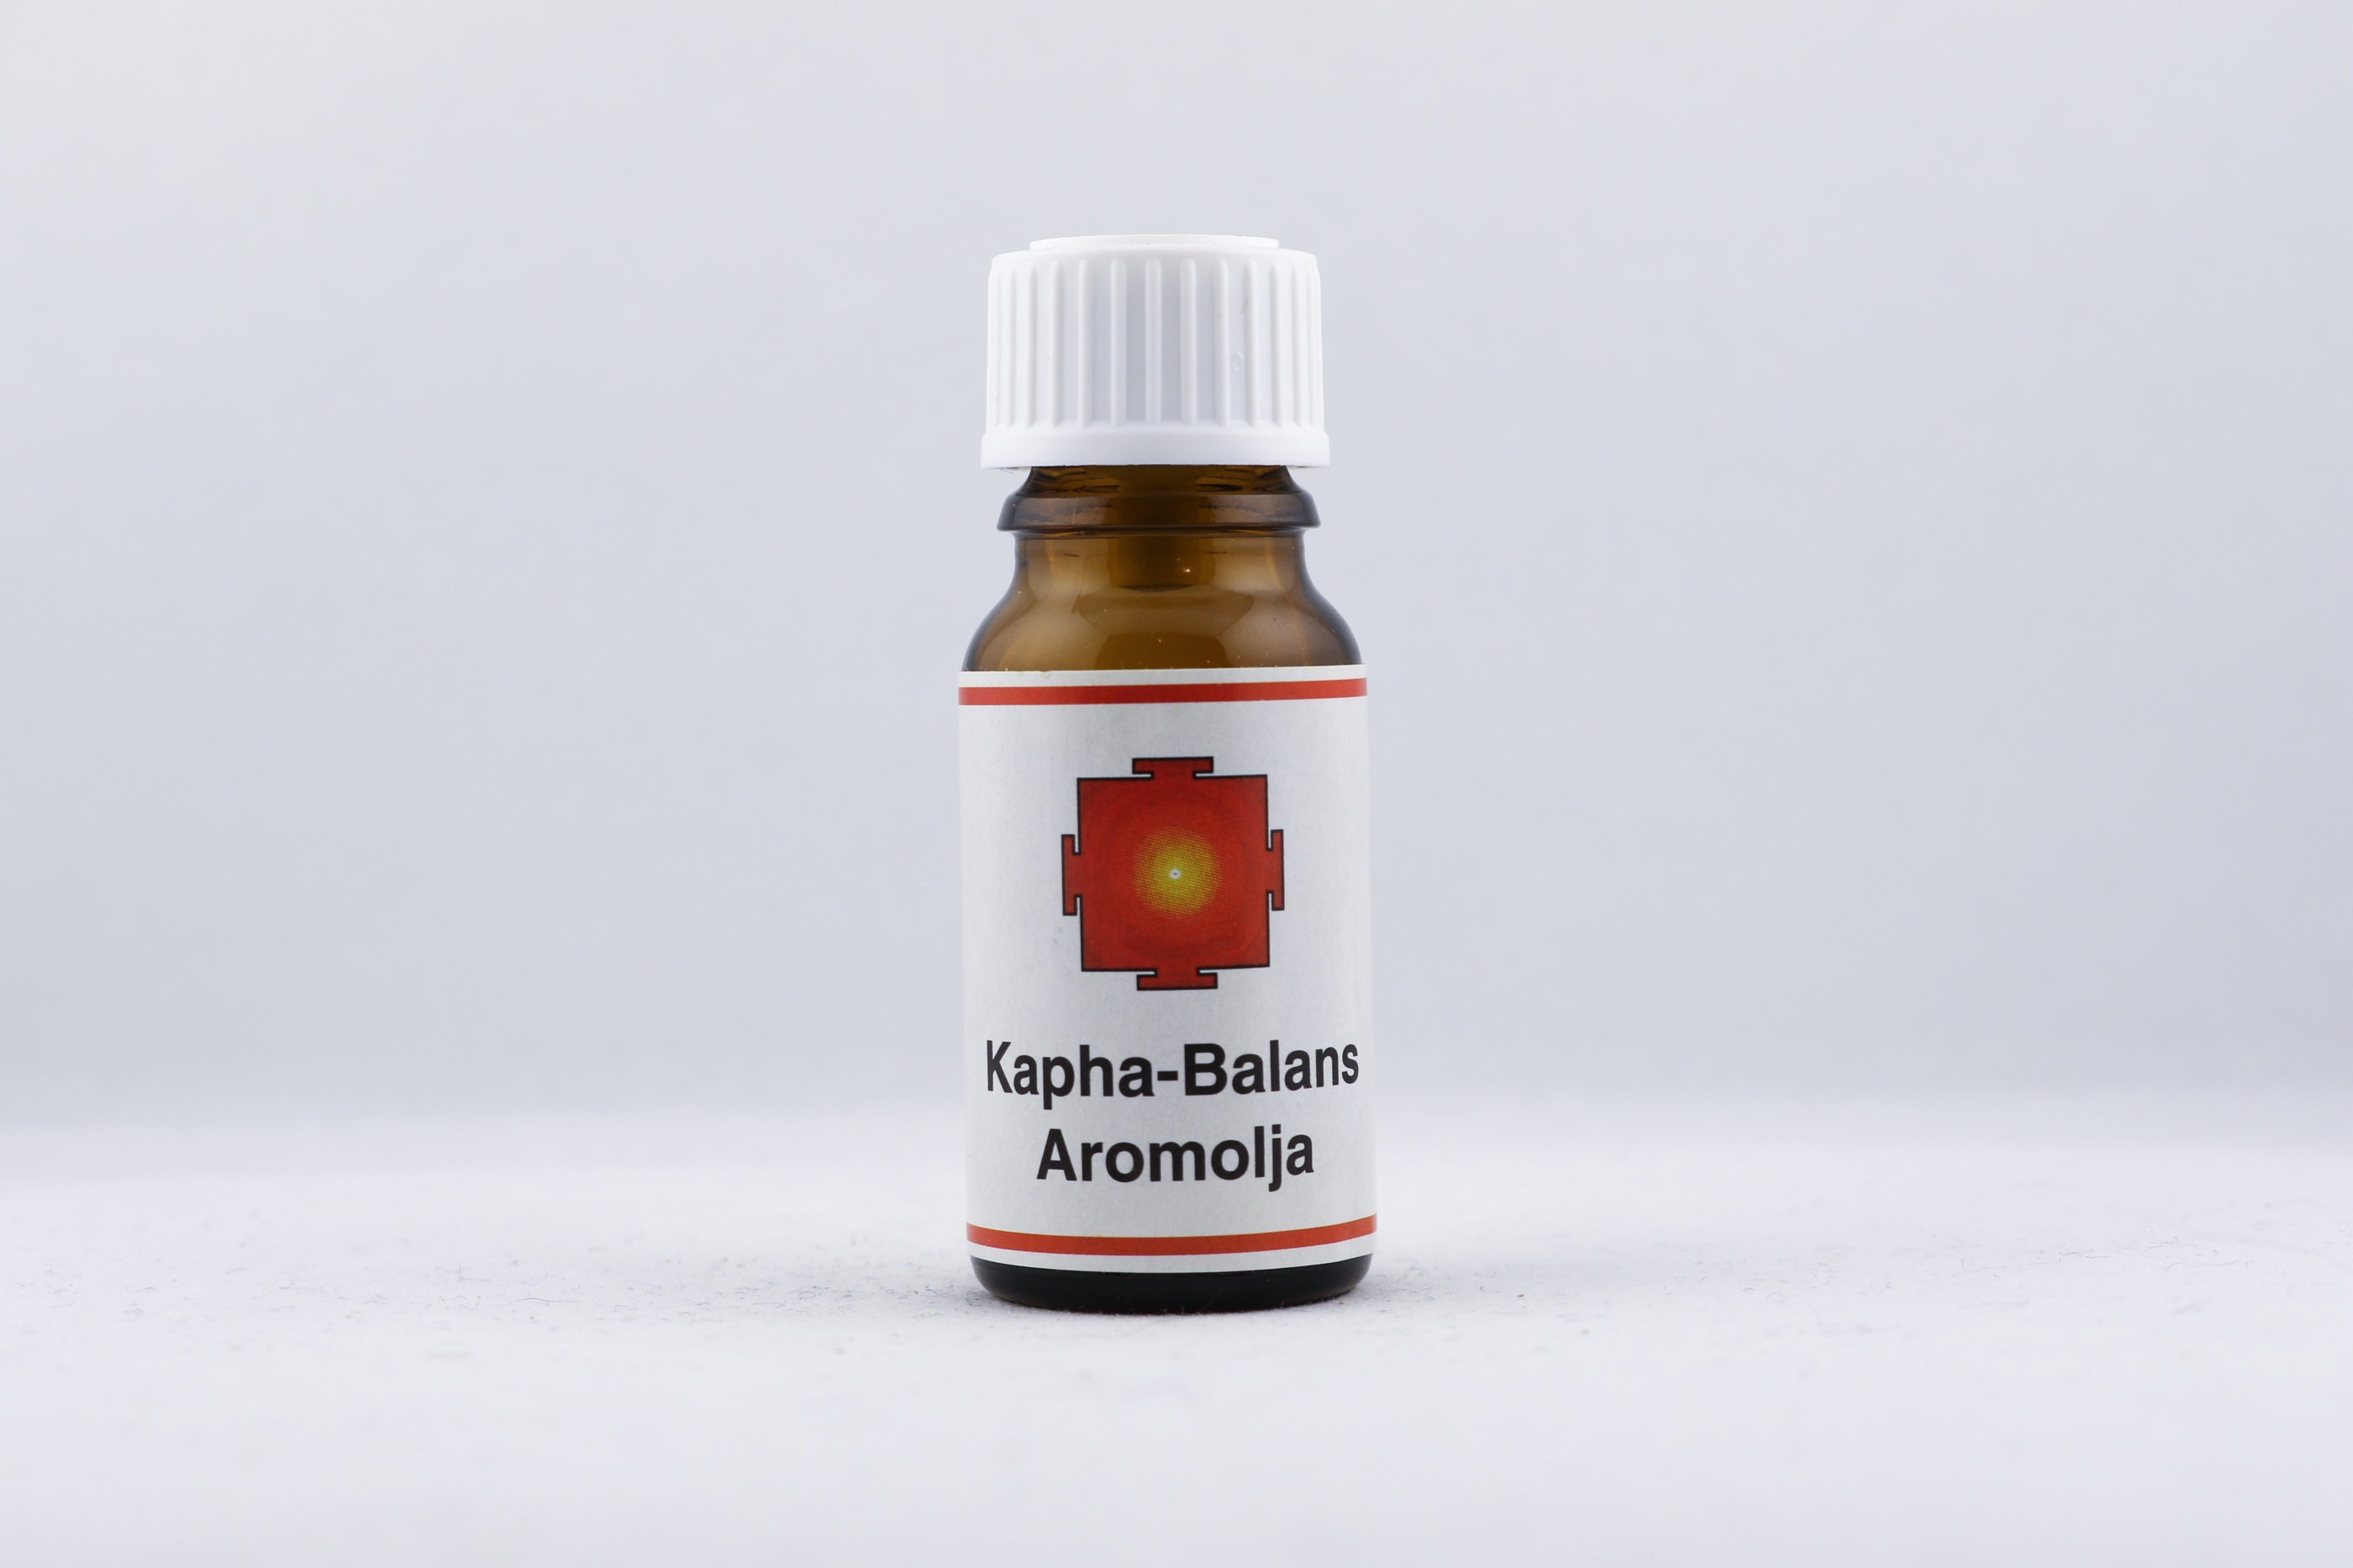 Kapha-balans eterisk olja wellness ayurveda halmstad sweden svensk eterisk aroma olja